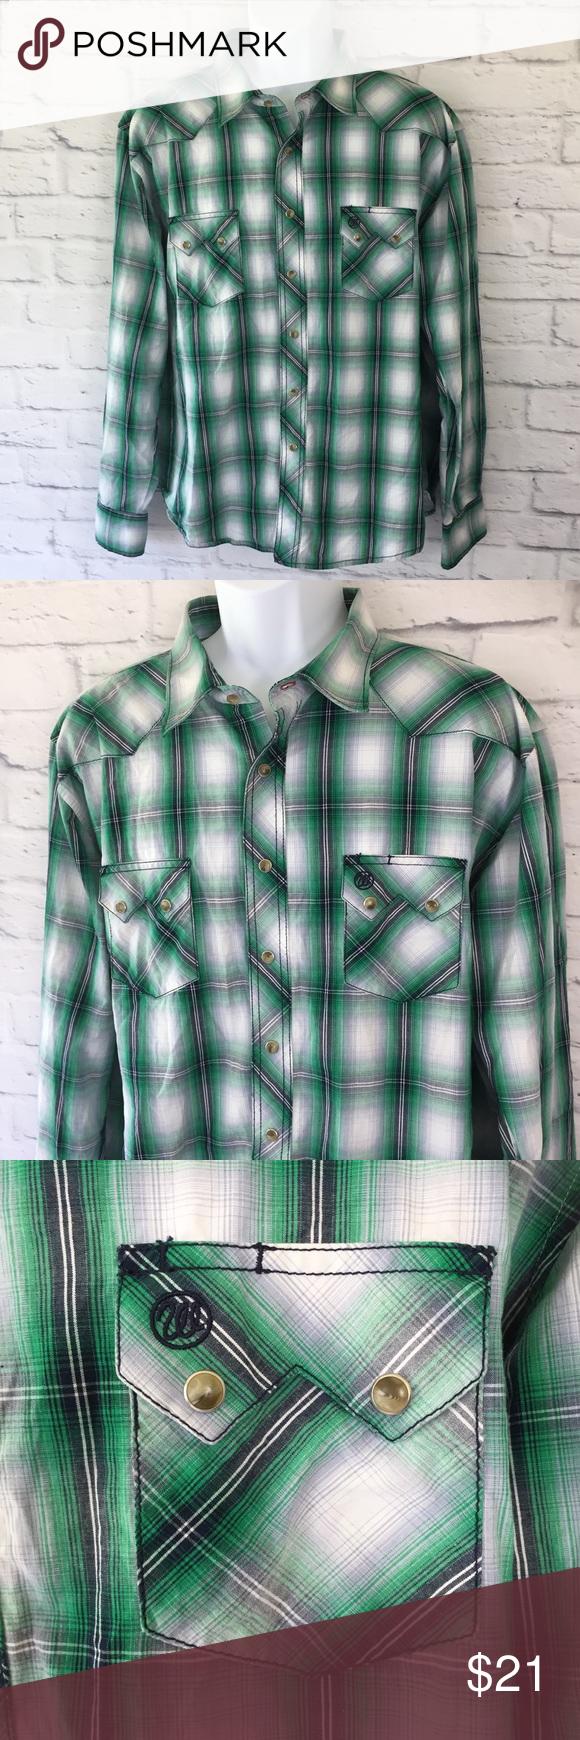 Flannel shirt knot  Wrangler Menus Flannel Shirt Button Down XXLarge Wrangler Flannel